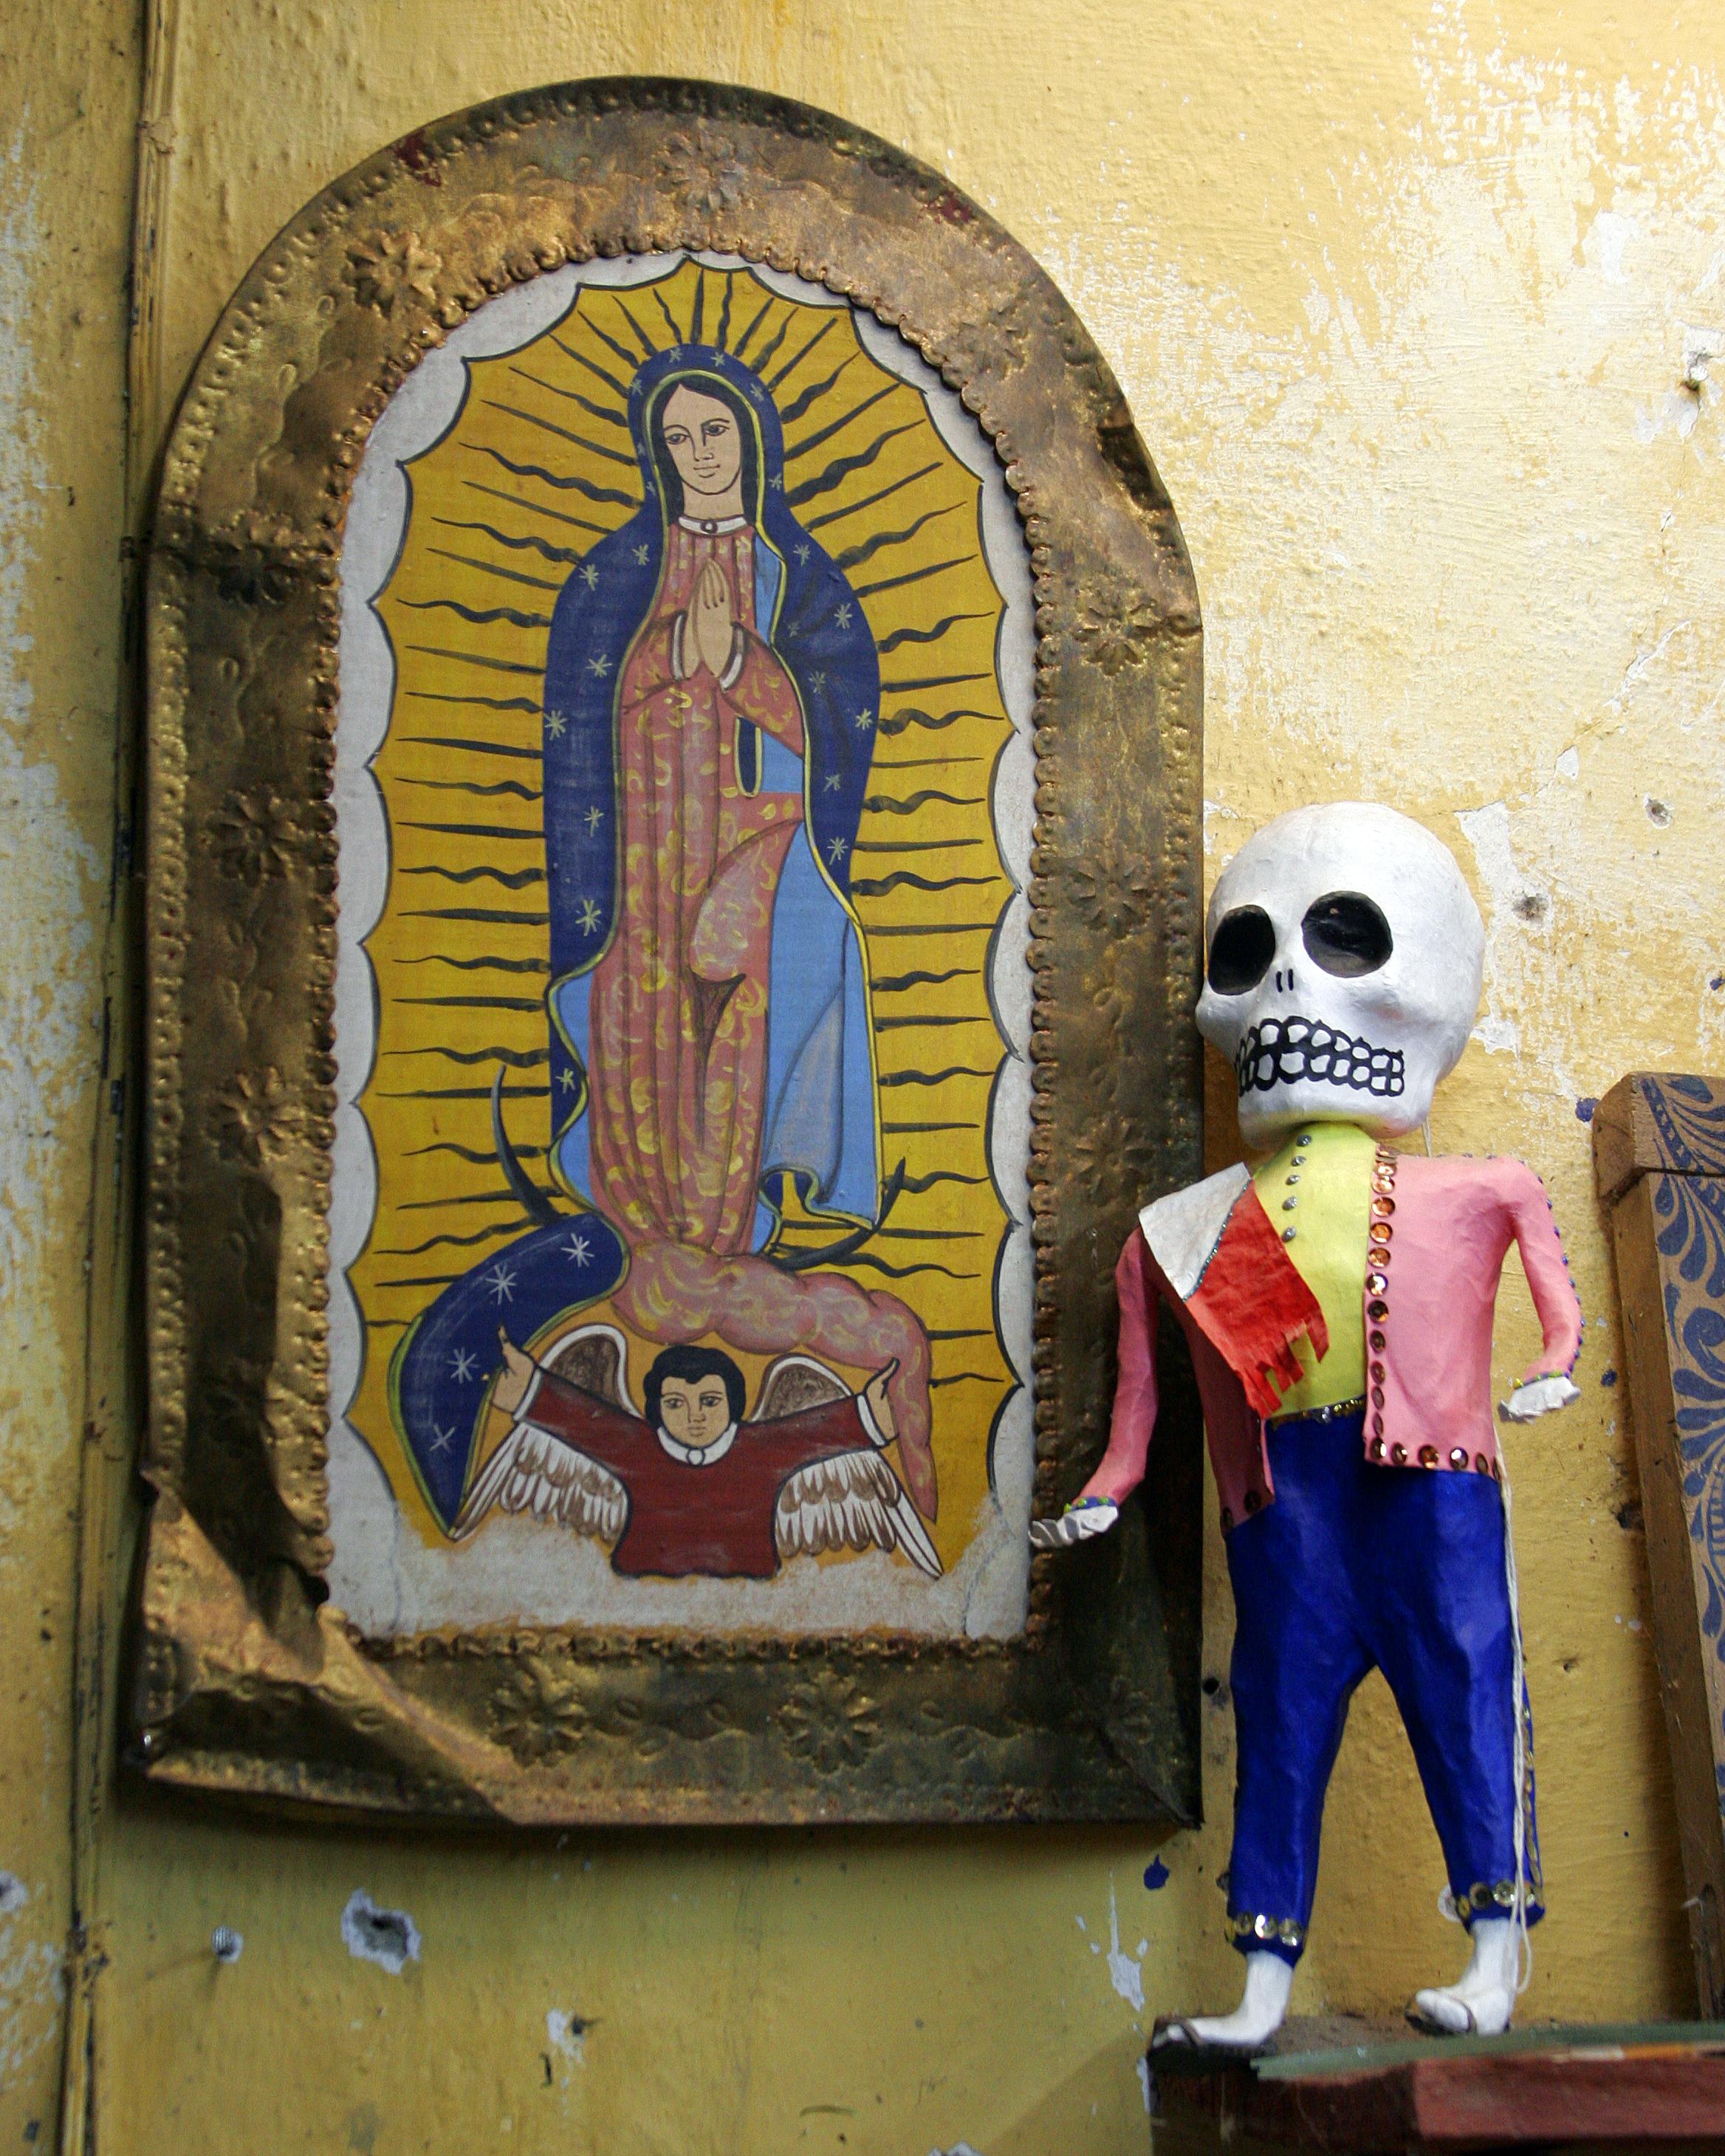 https://upload.wikimedia.org/wikipedia/commons/b/bb/Mexican_folk_art.jpg